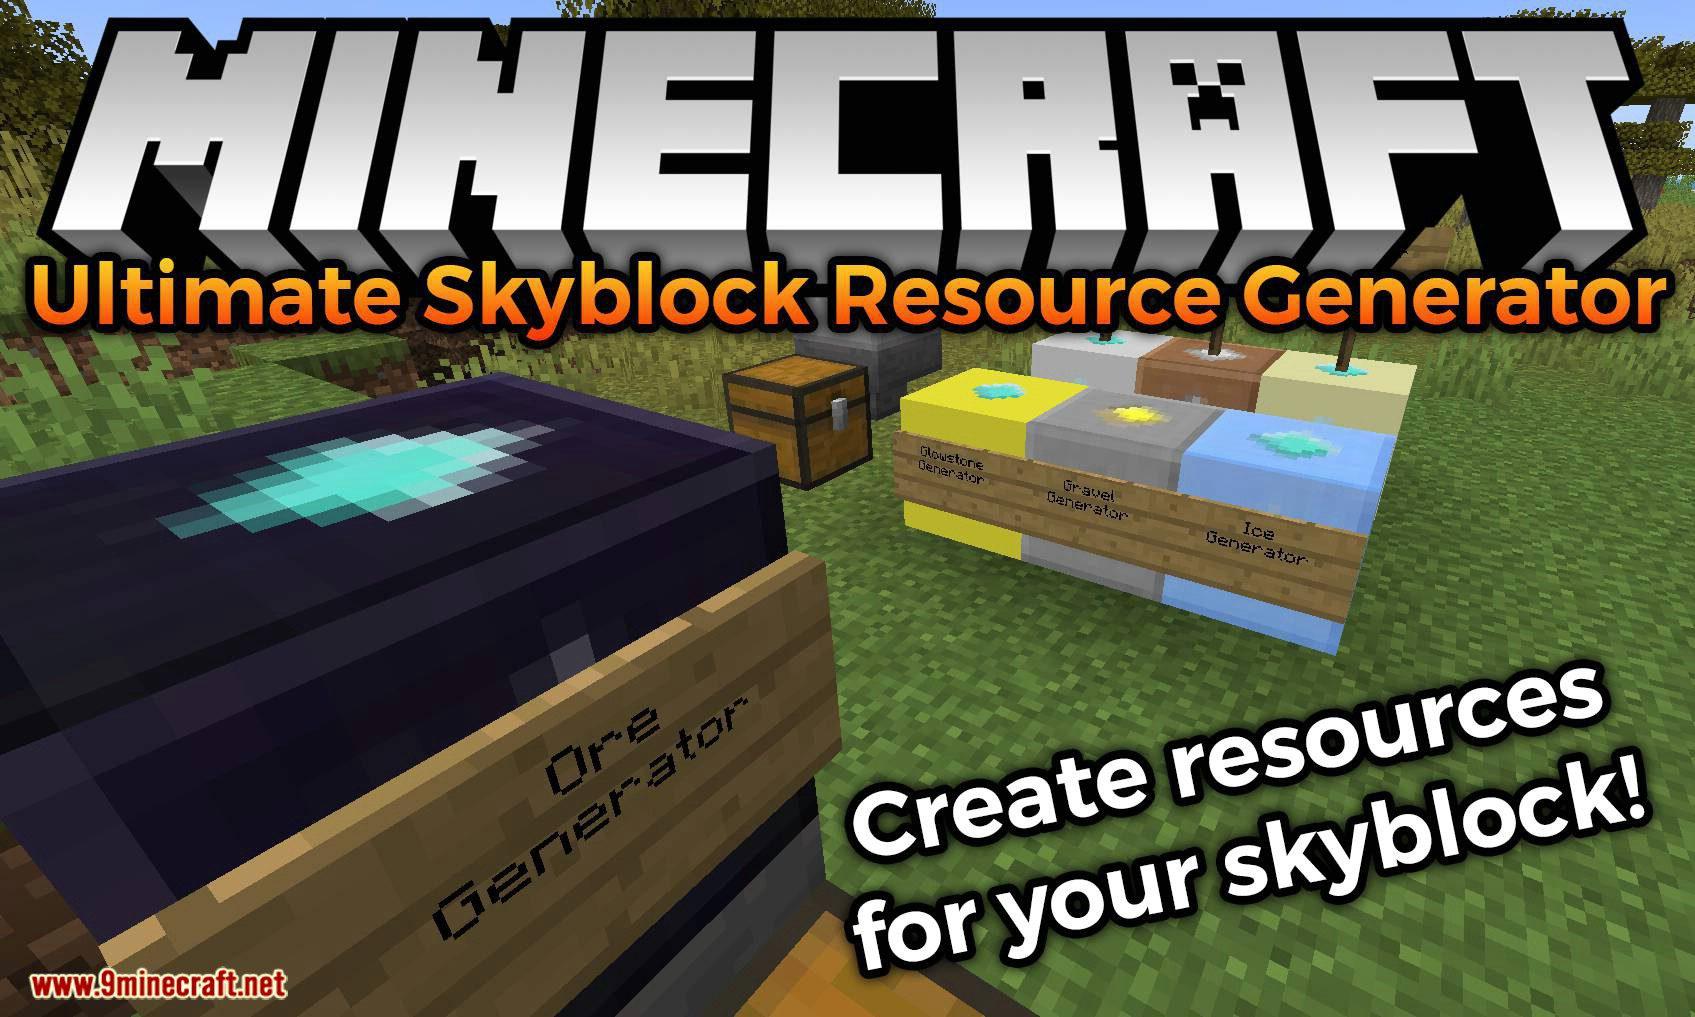 Ultimate Skyblock Resource Generator mod for minecraft logo